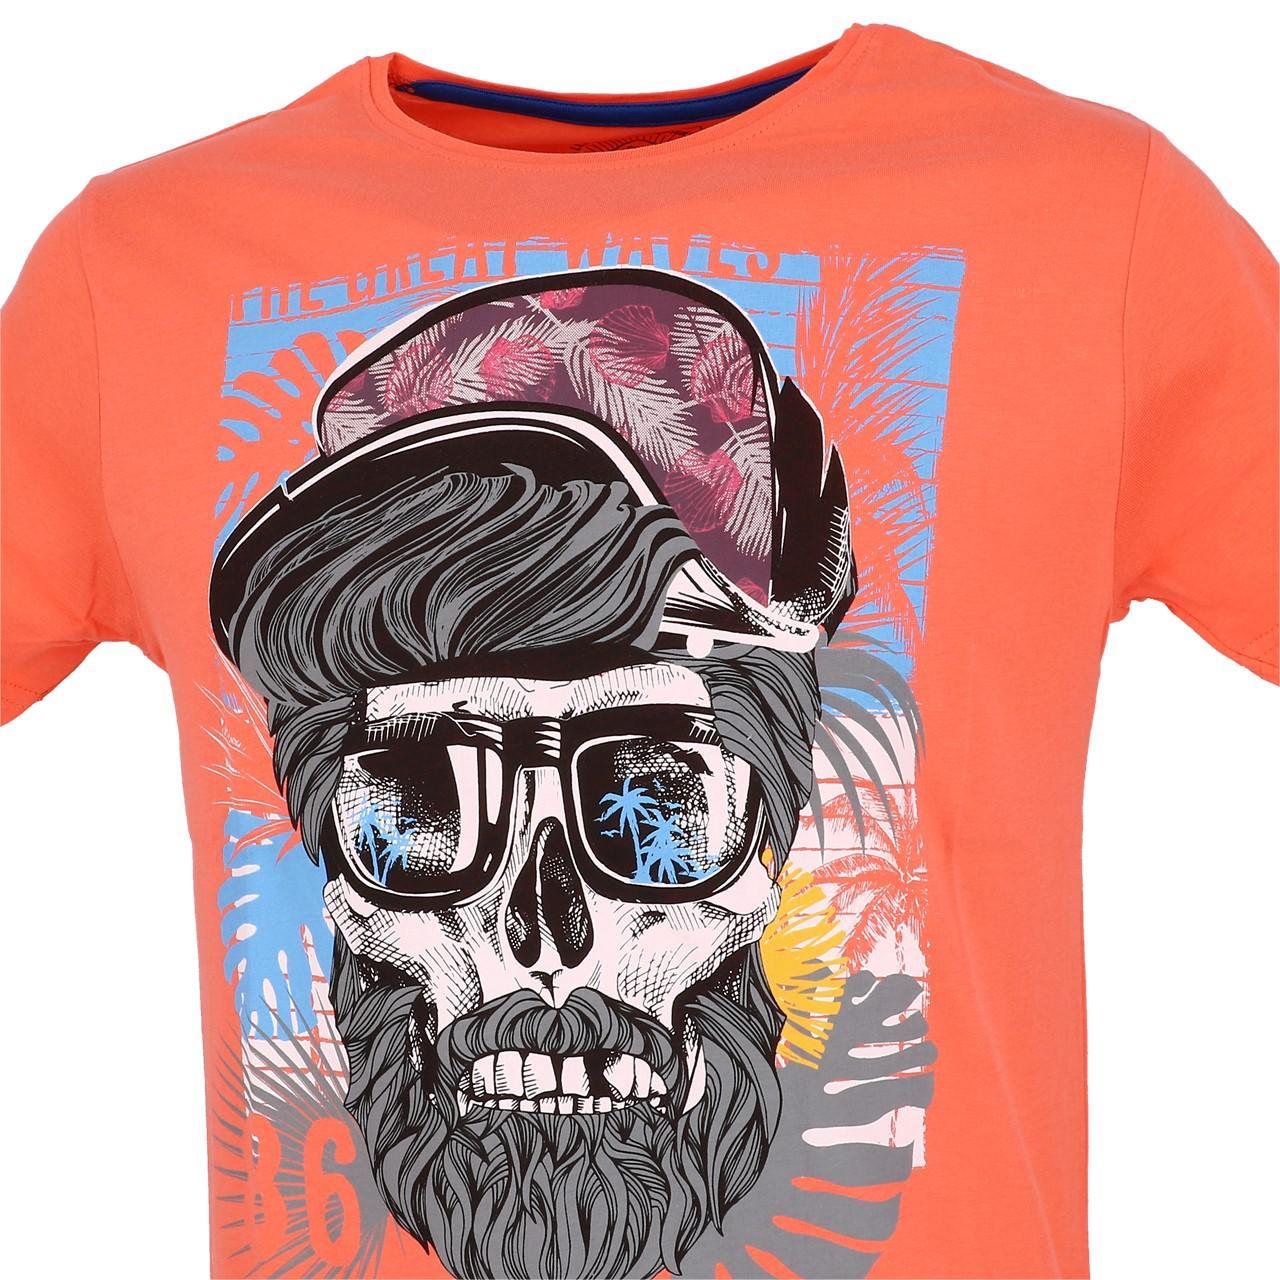 Short-La-maison-blaggio-Mably-Hot-Coral-Mc-Tee-Orange-93614 thumbnail 2